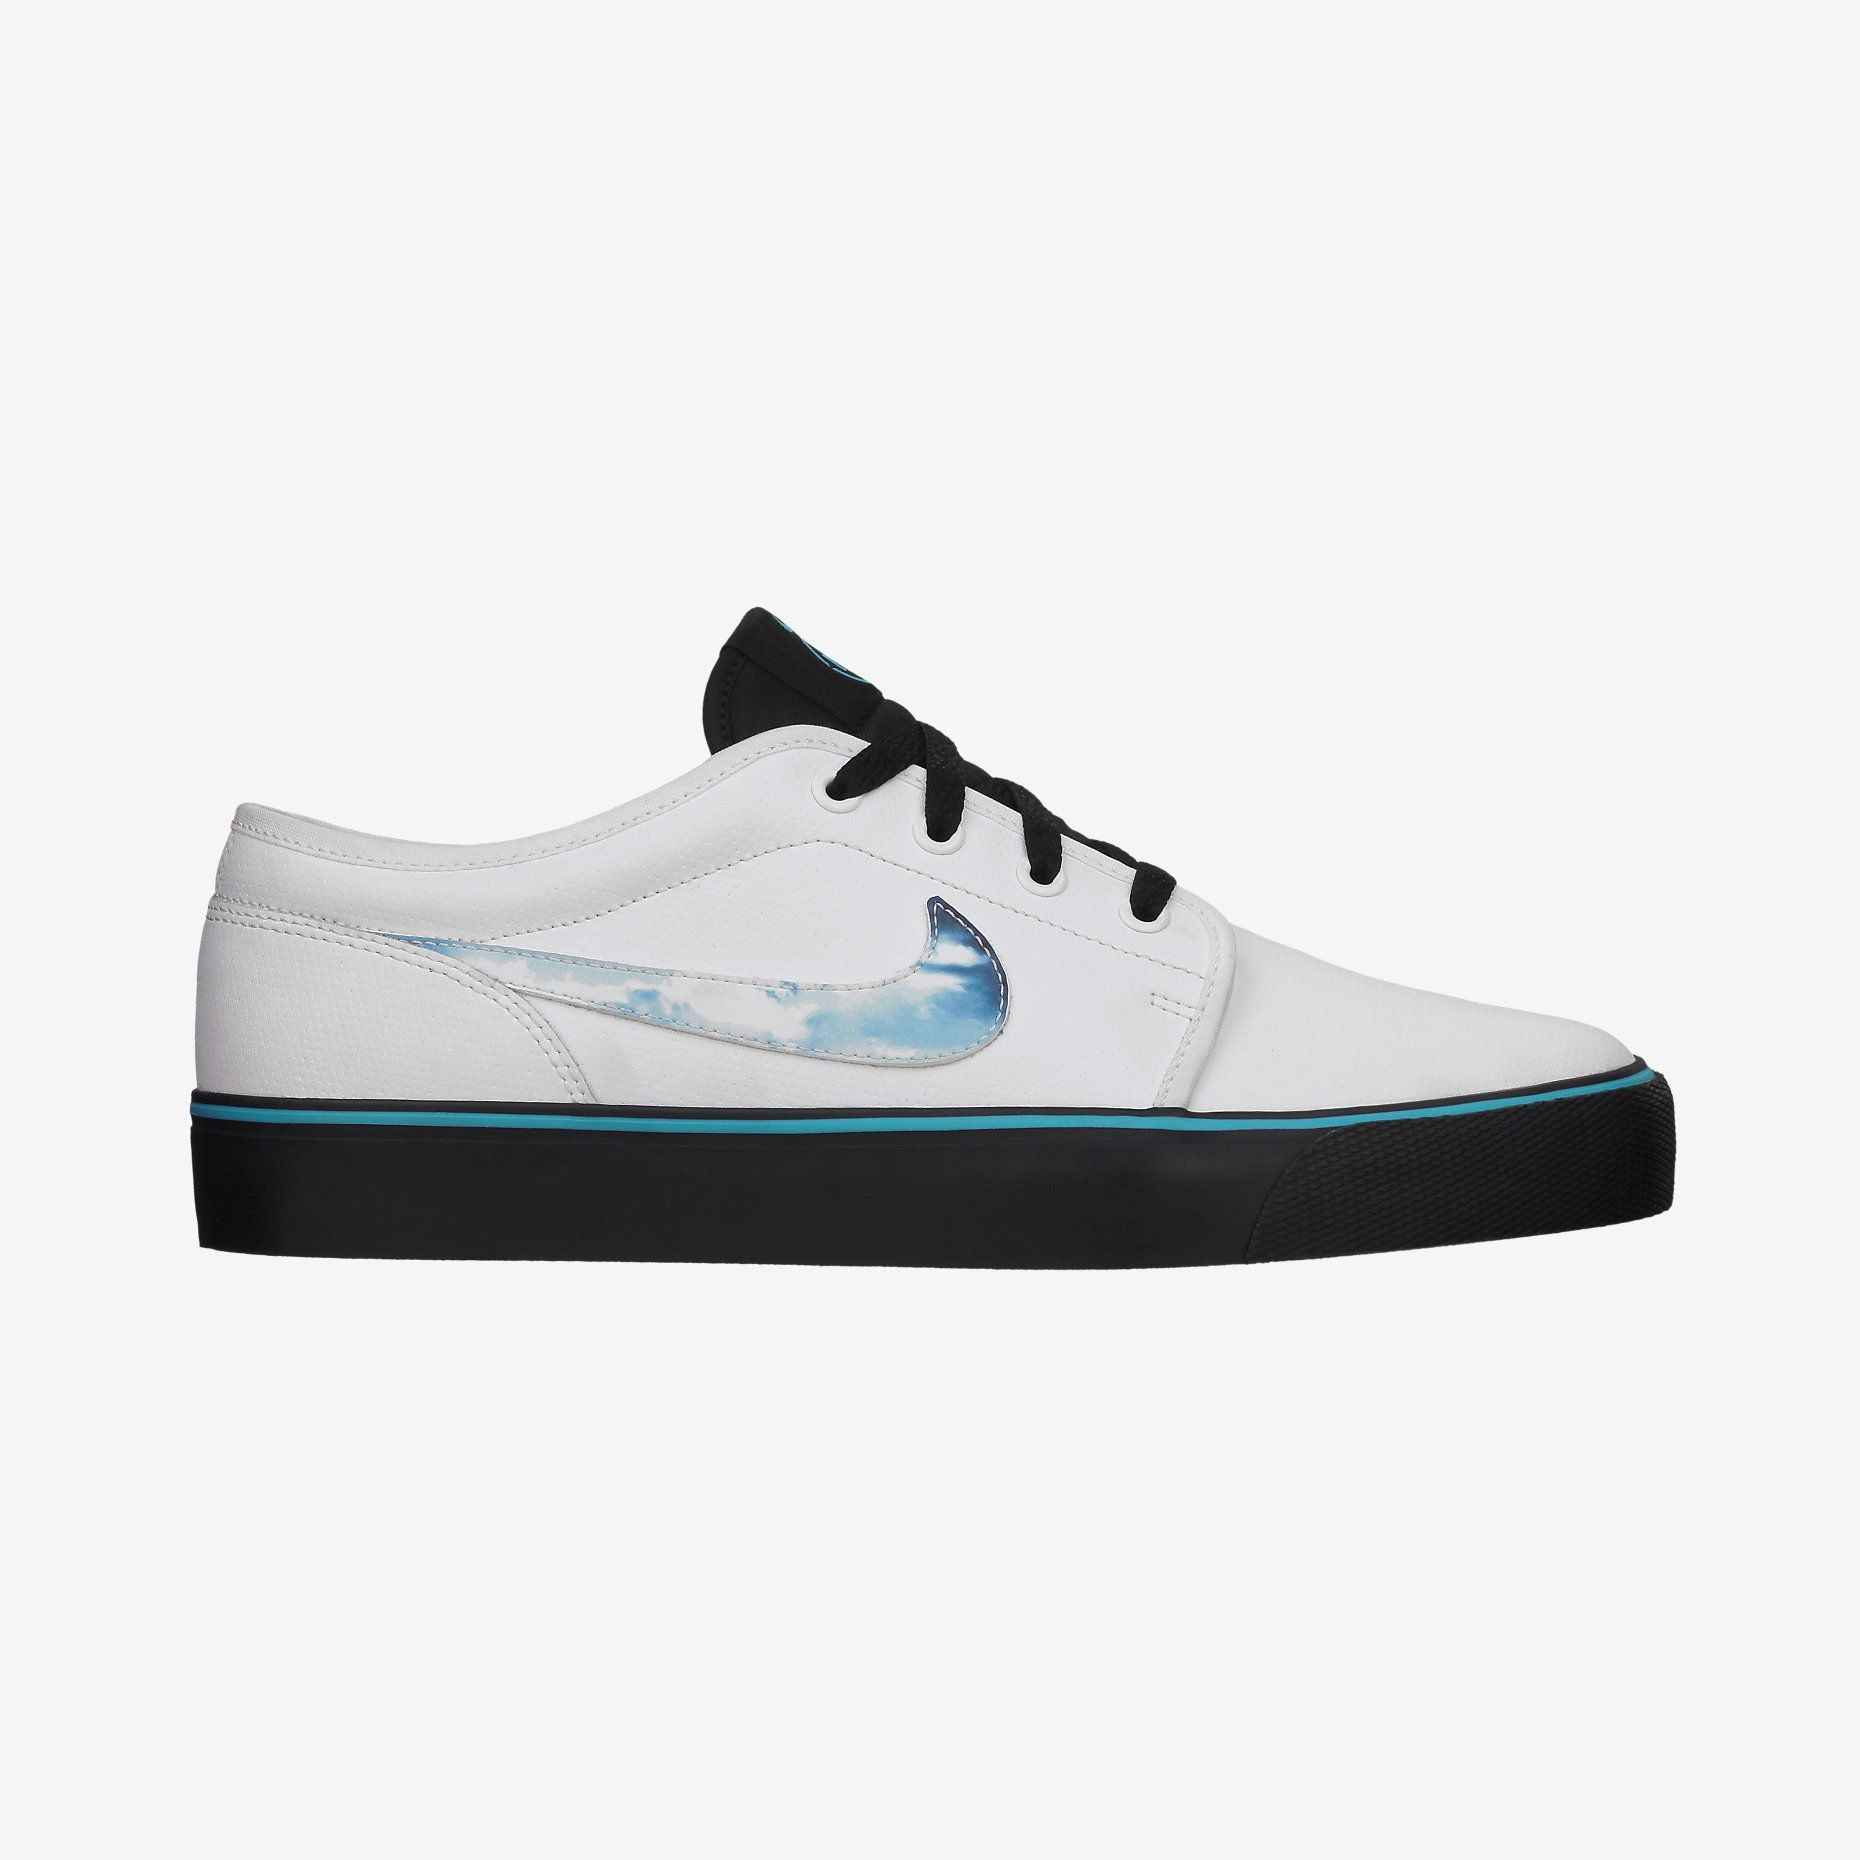 promo code 7fd18 21175 Nike Toki Low Leather N7 Men s Shoe. Nike Store